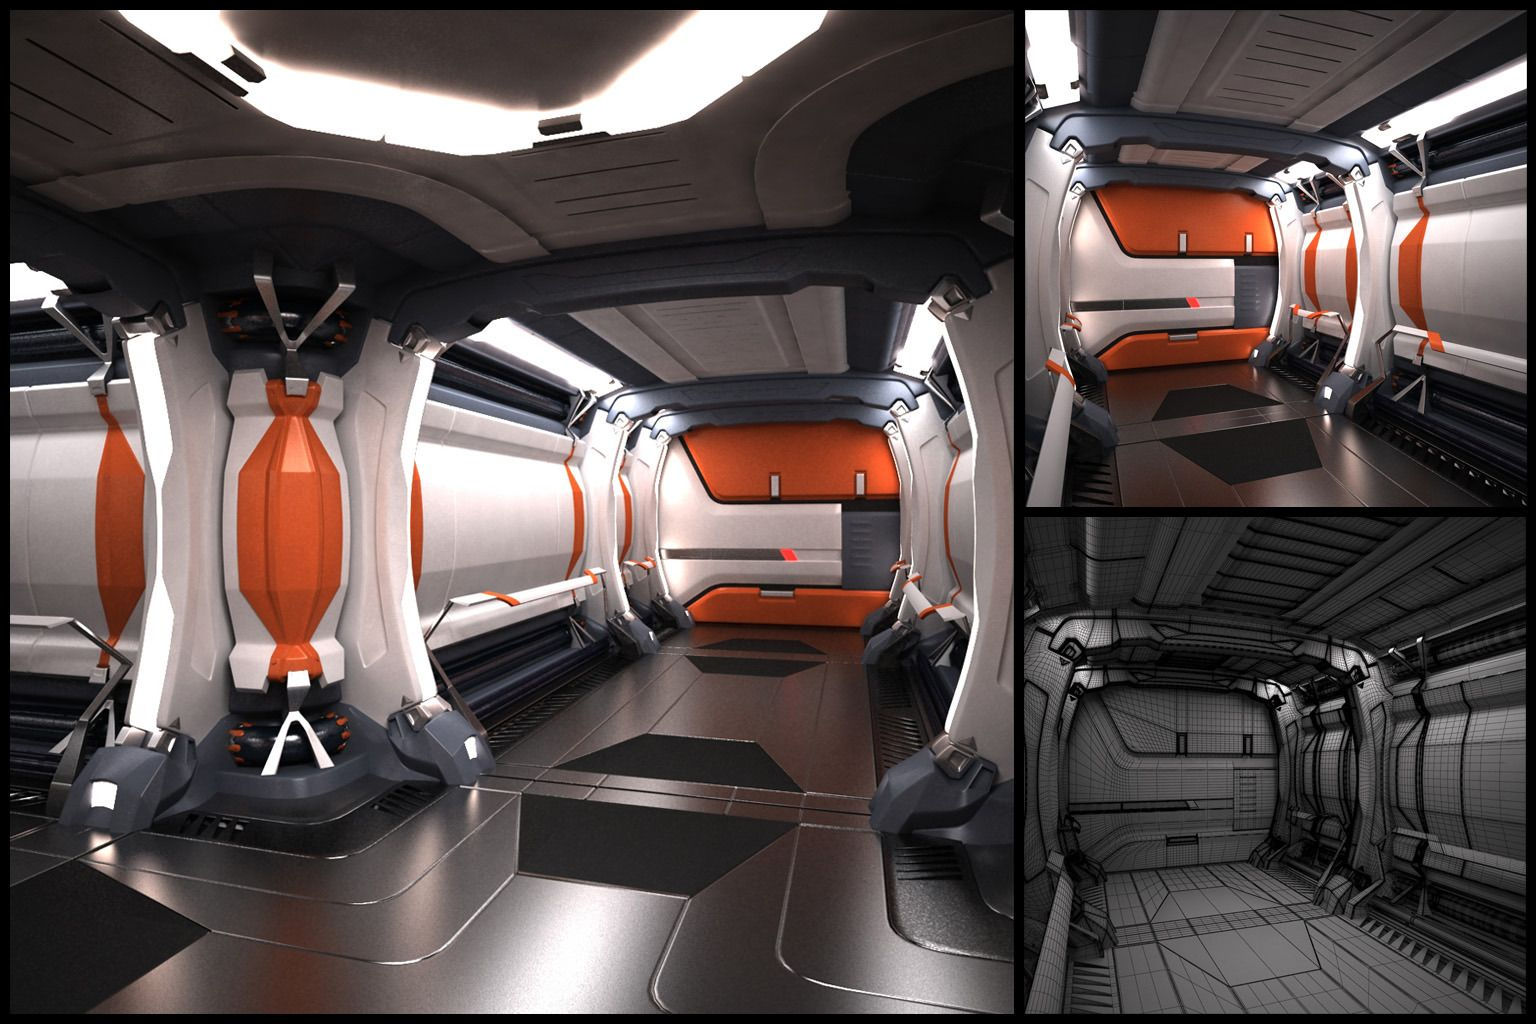 sci fi corridor futuristic interior futuristic. Black Bedroom Furniture Sets. Home Design Ideas